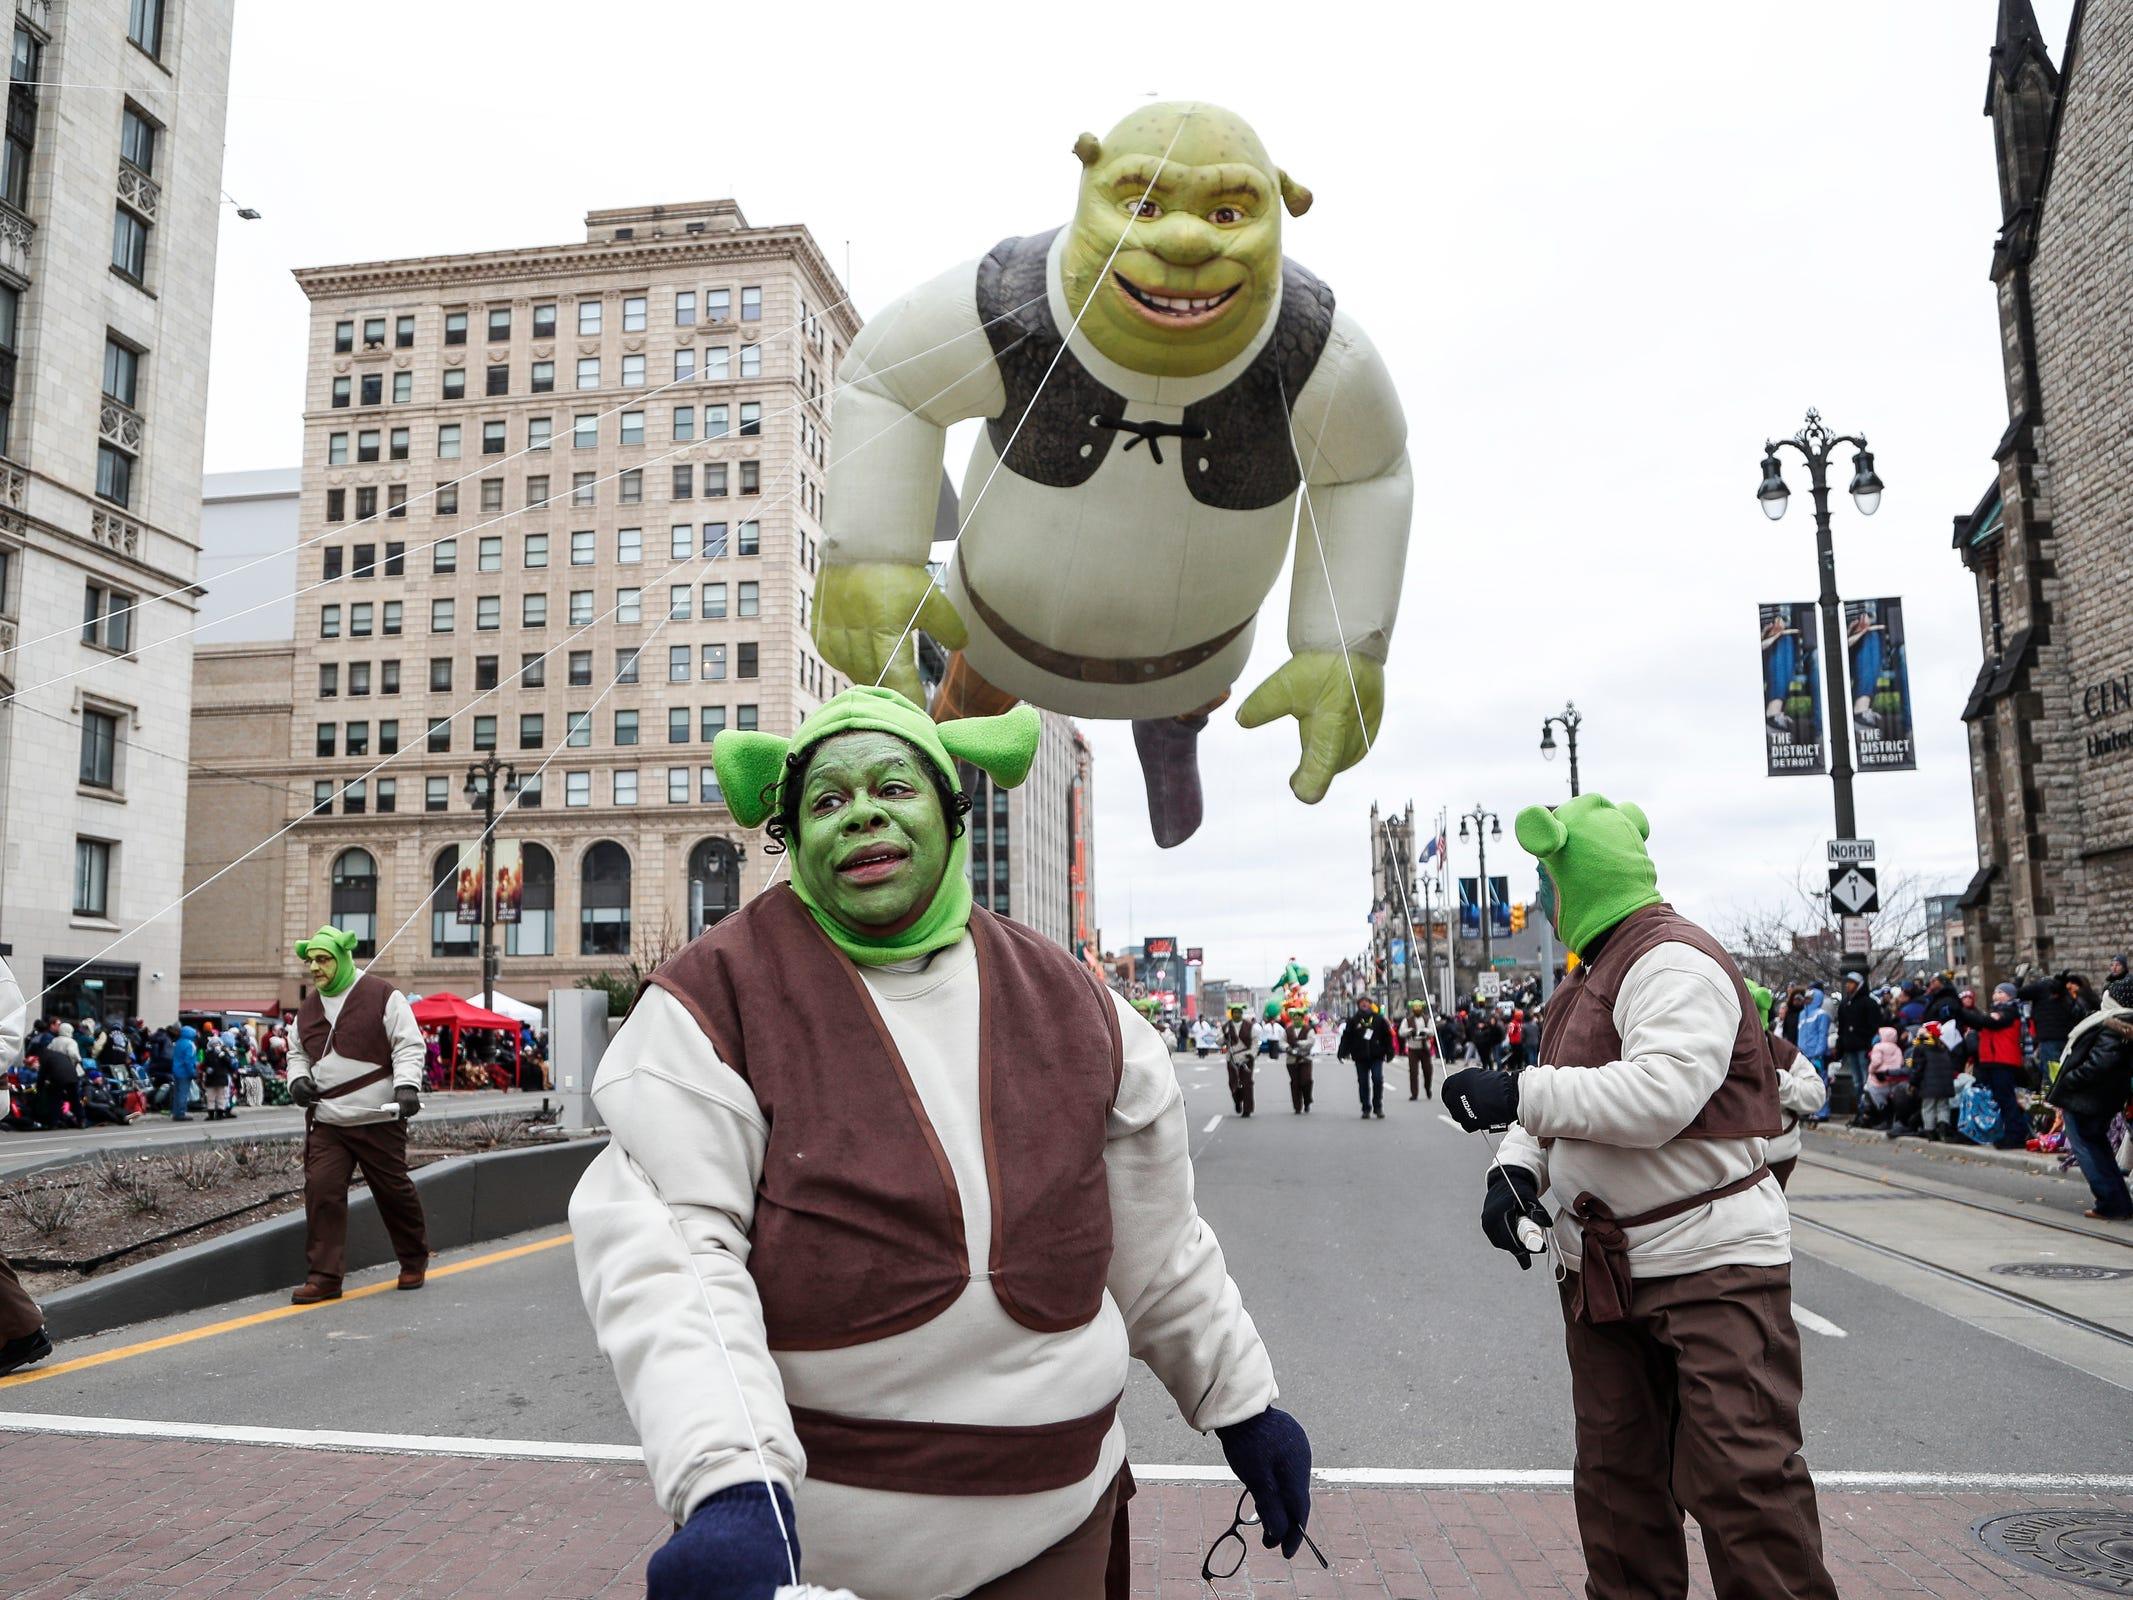 Shrek float handler Wendy Little, center, takes the balloon down Woodward Avenue during the 92nd America's Thanksgiving Day Parade in Detroit, Thursday, Nov. 22, 2018.